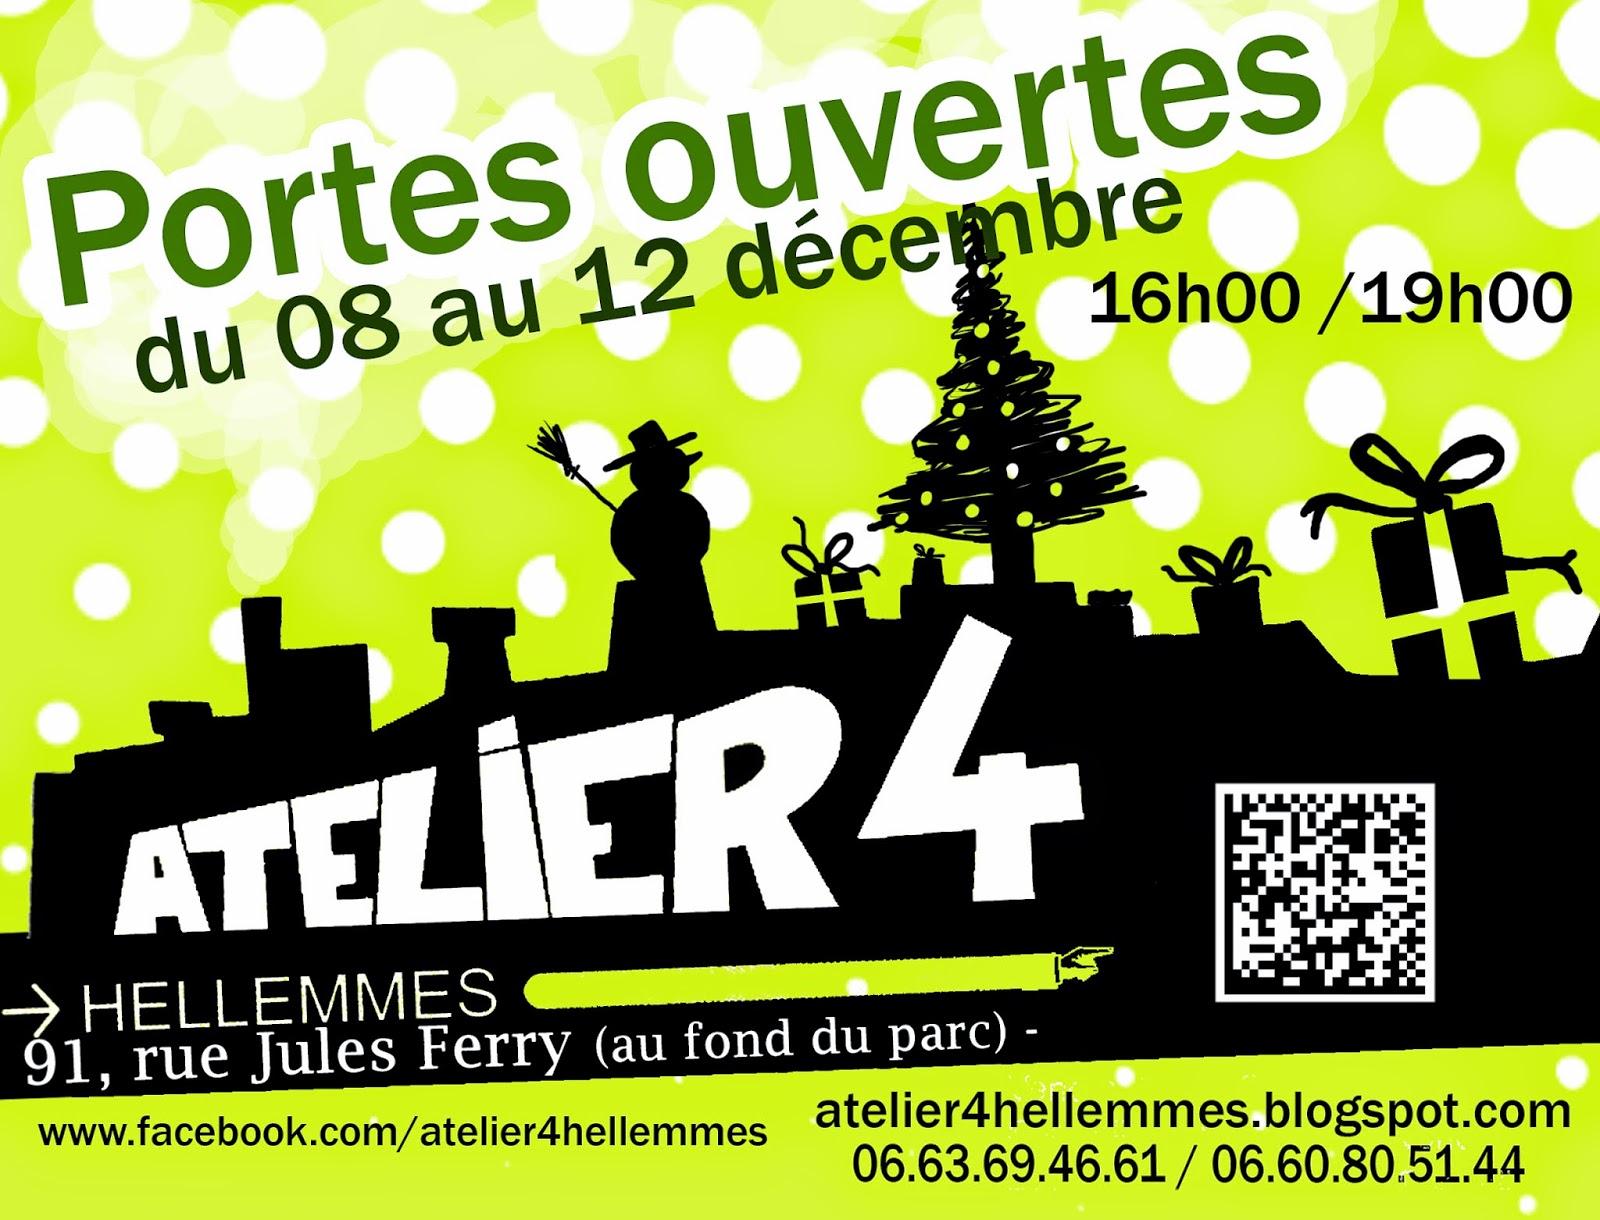 www.facebook.com/atelier4hellemmes